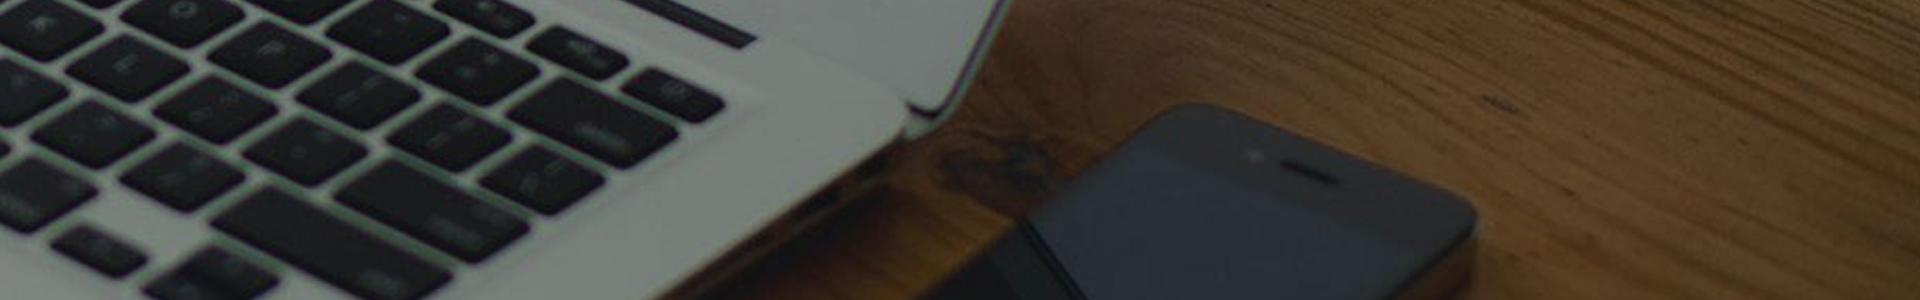 Banner showing website development